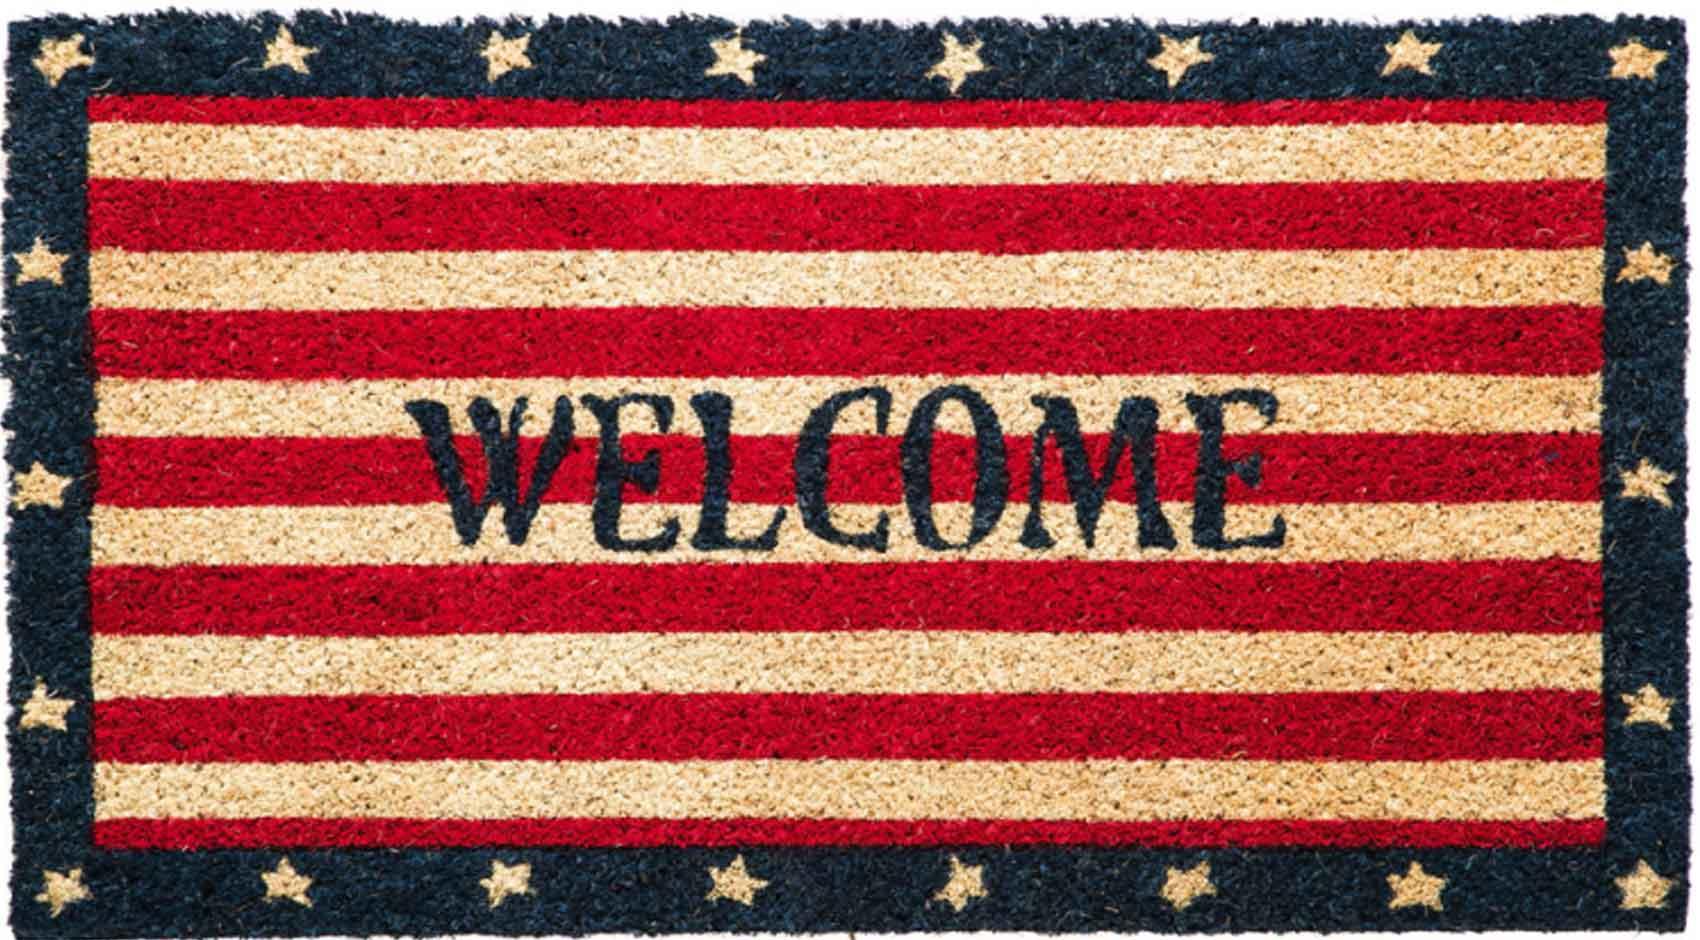 coco coir patriotic welcome rubber backed doormat 16 x 28